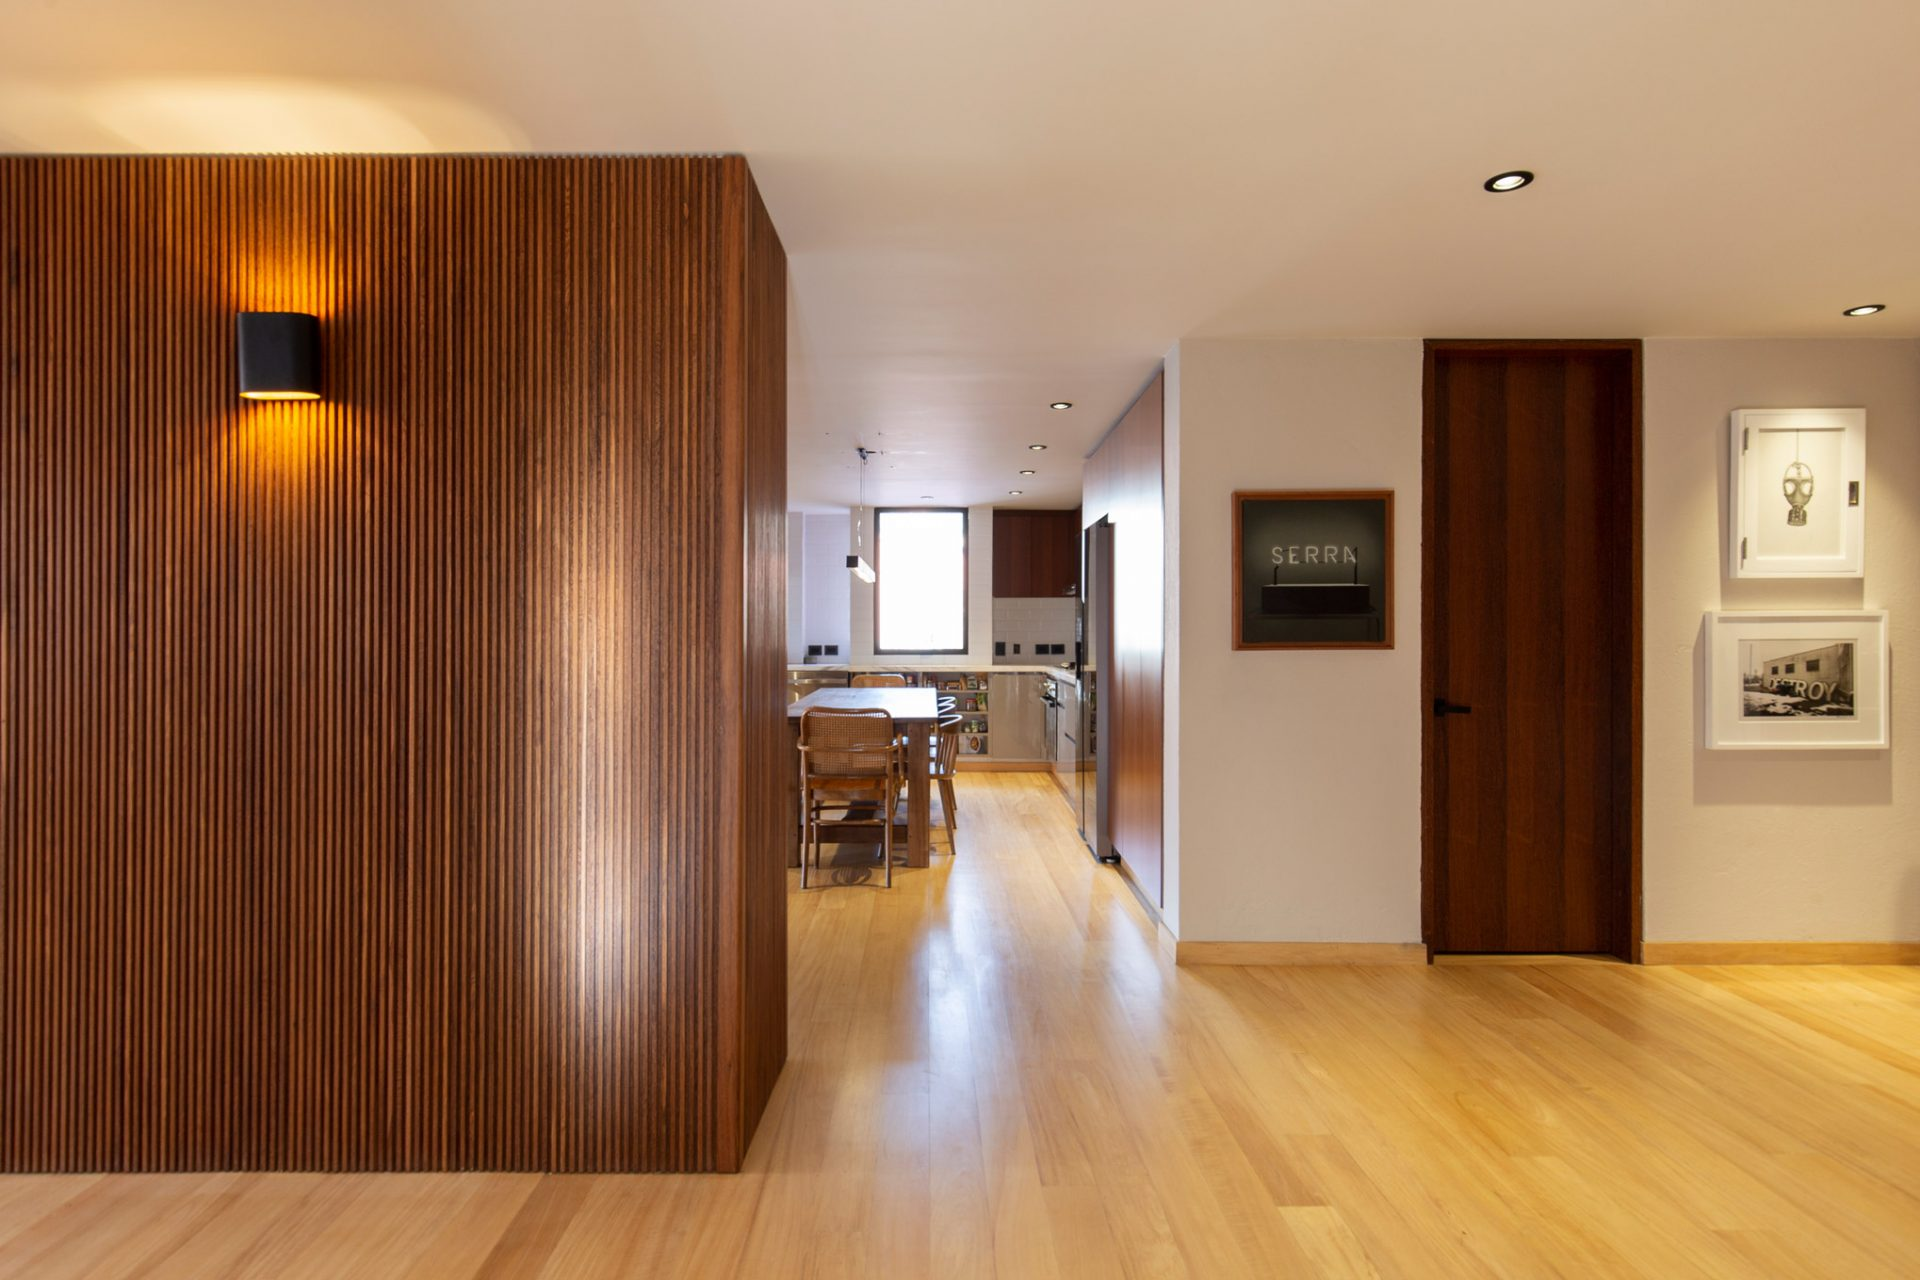 14.MLS_arquitectura_taller_tragaluz_interior_dutch_bogota_colombia_simon_bosch_photography